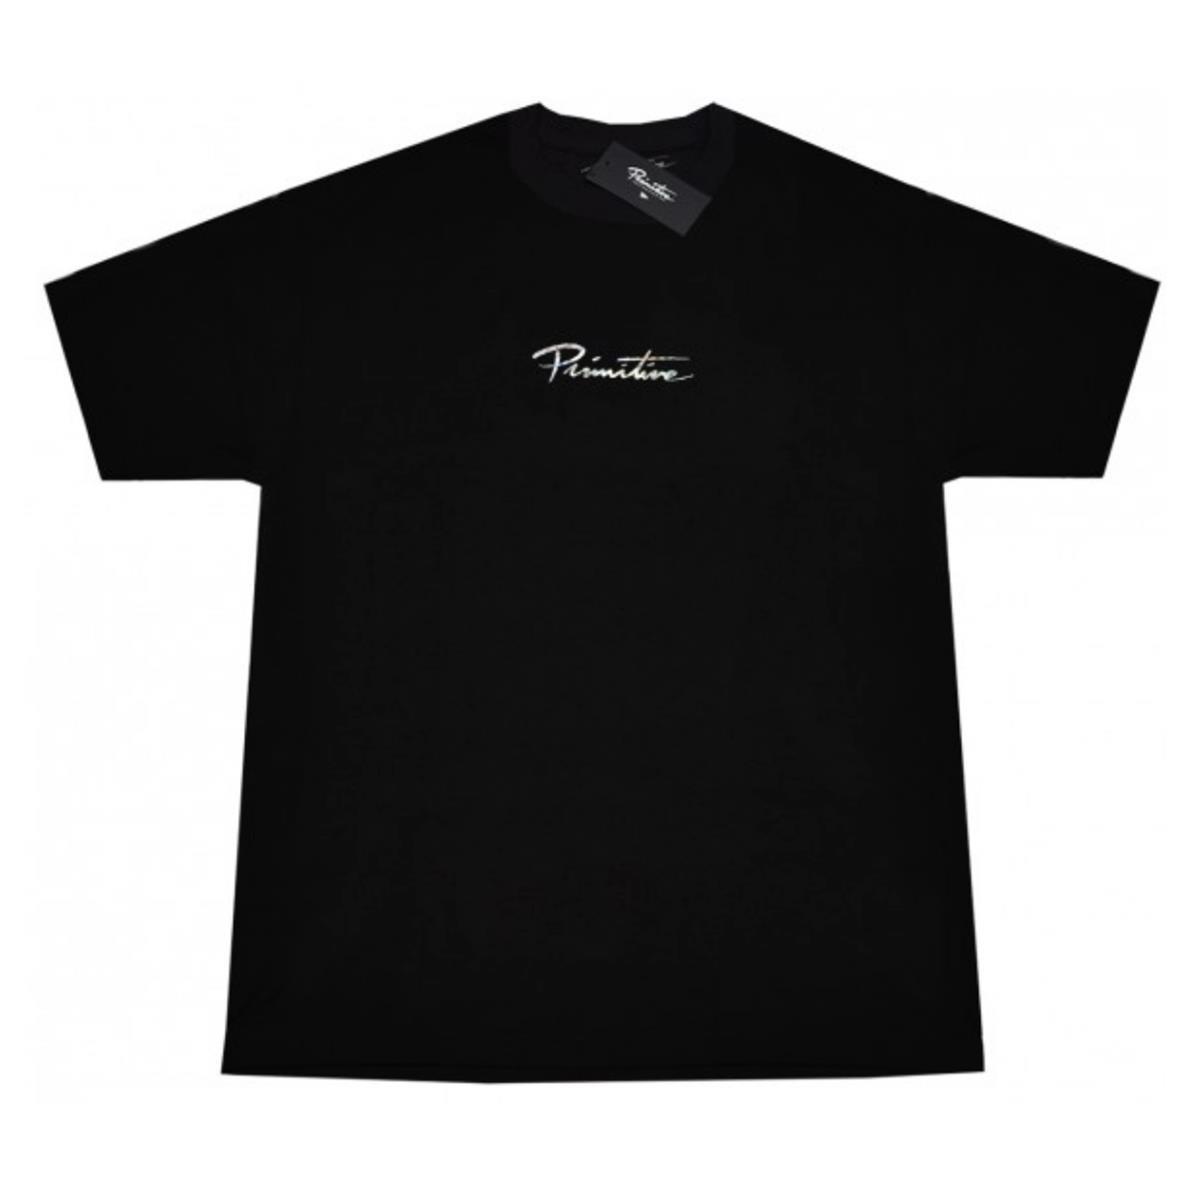 Camiseta Primitive Nuevo Hologram Tee Preto